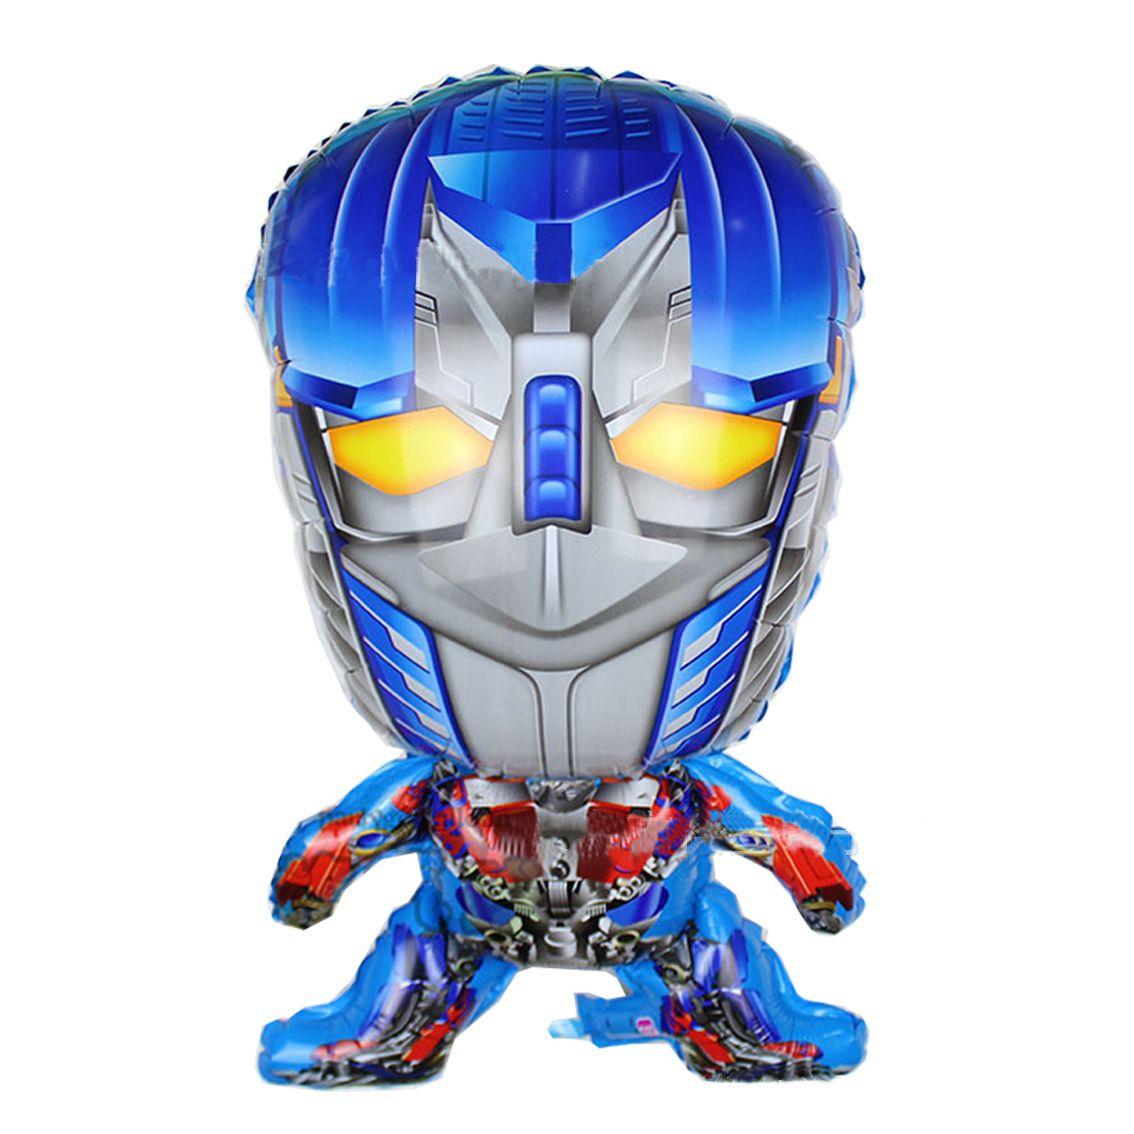 72x43cm Iron Man Cartoon Super Hero Gundam Foil Balloon Baby Child